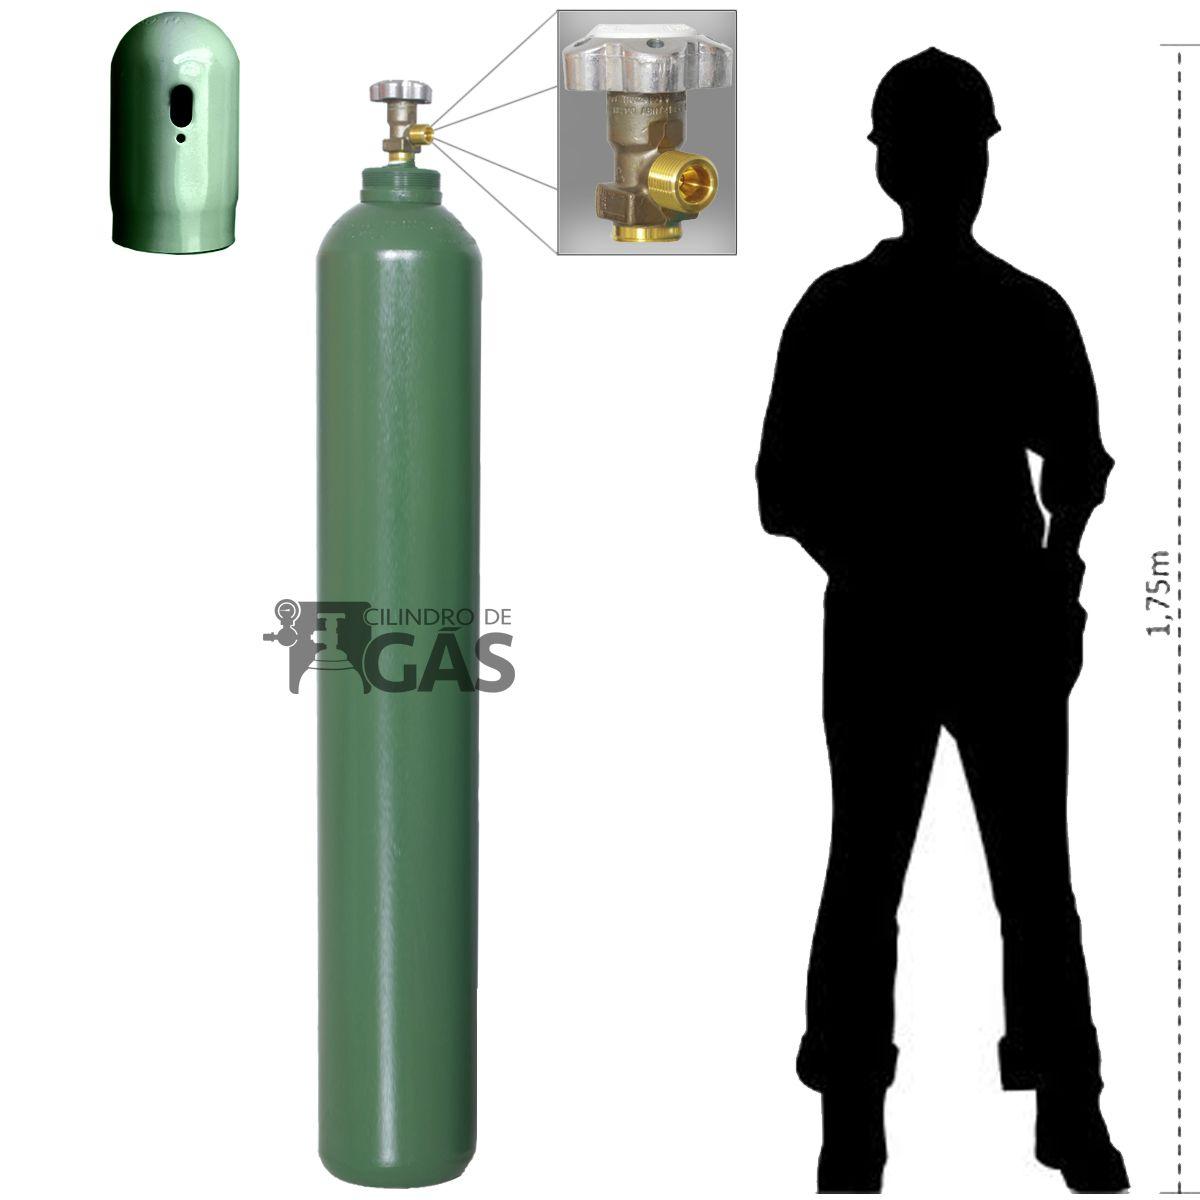 Cilindro para Oxigênio Medicinal - 50L